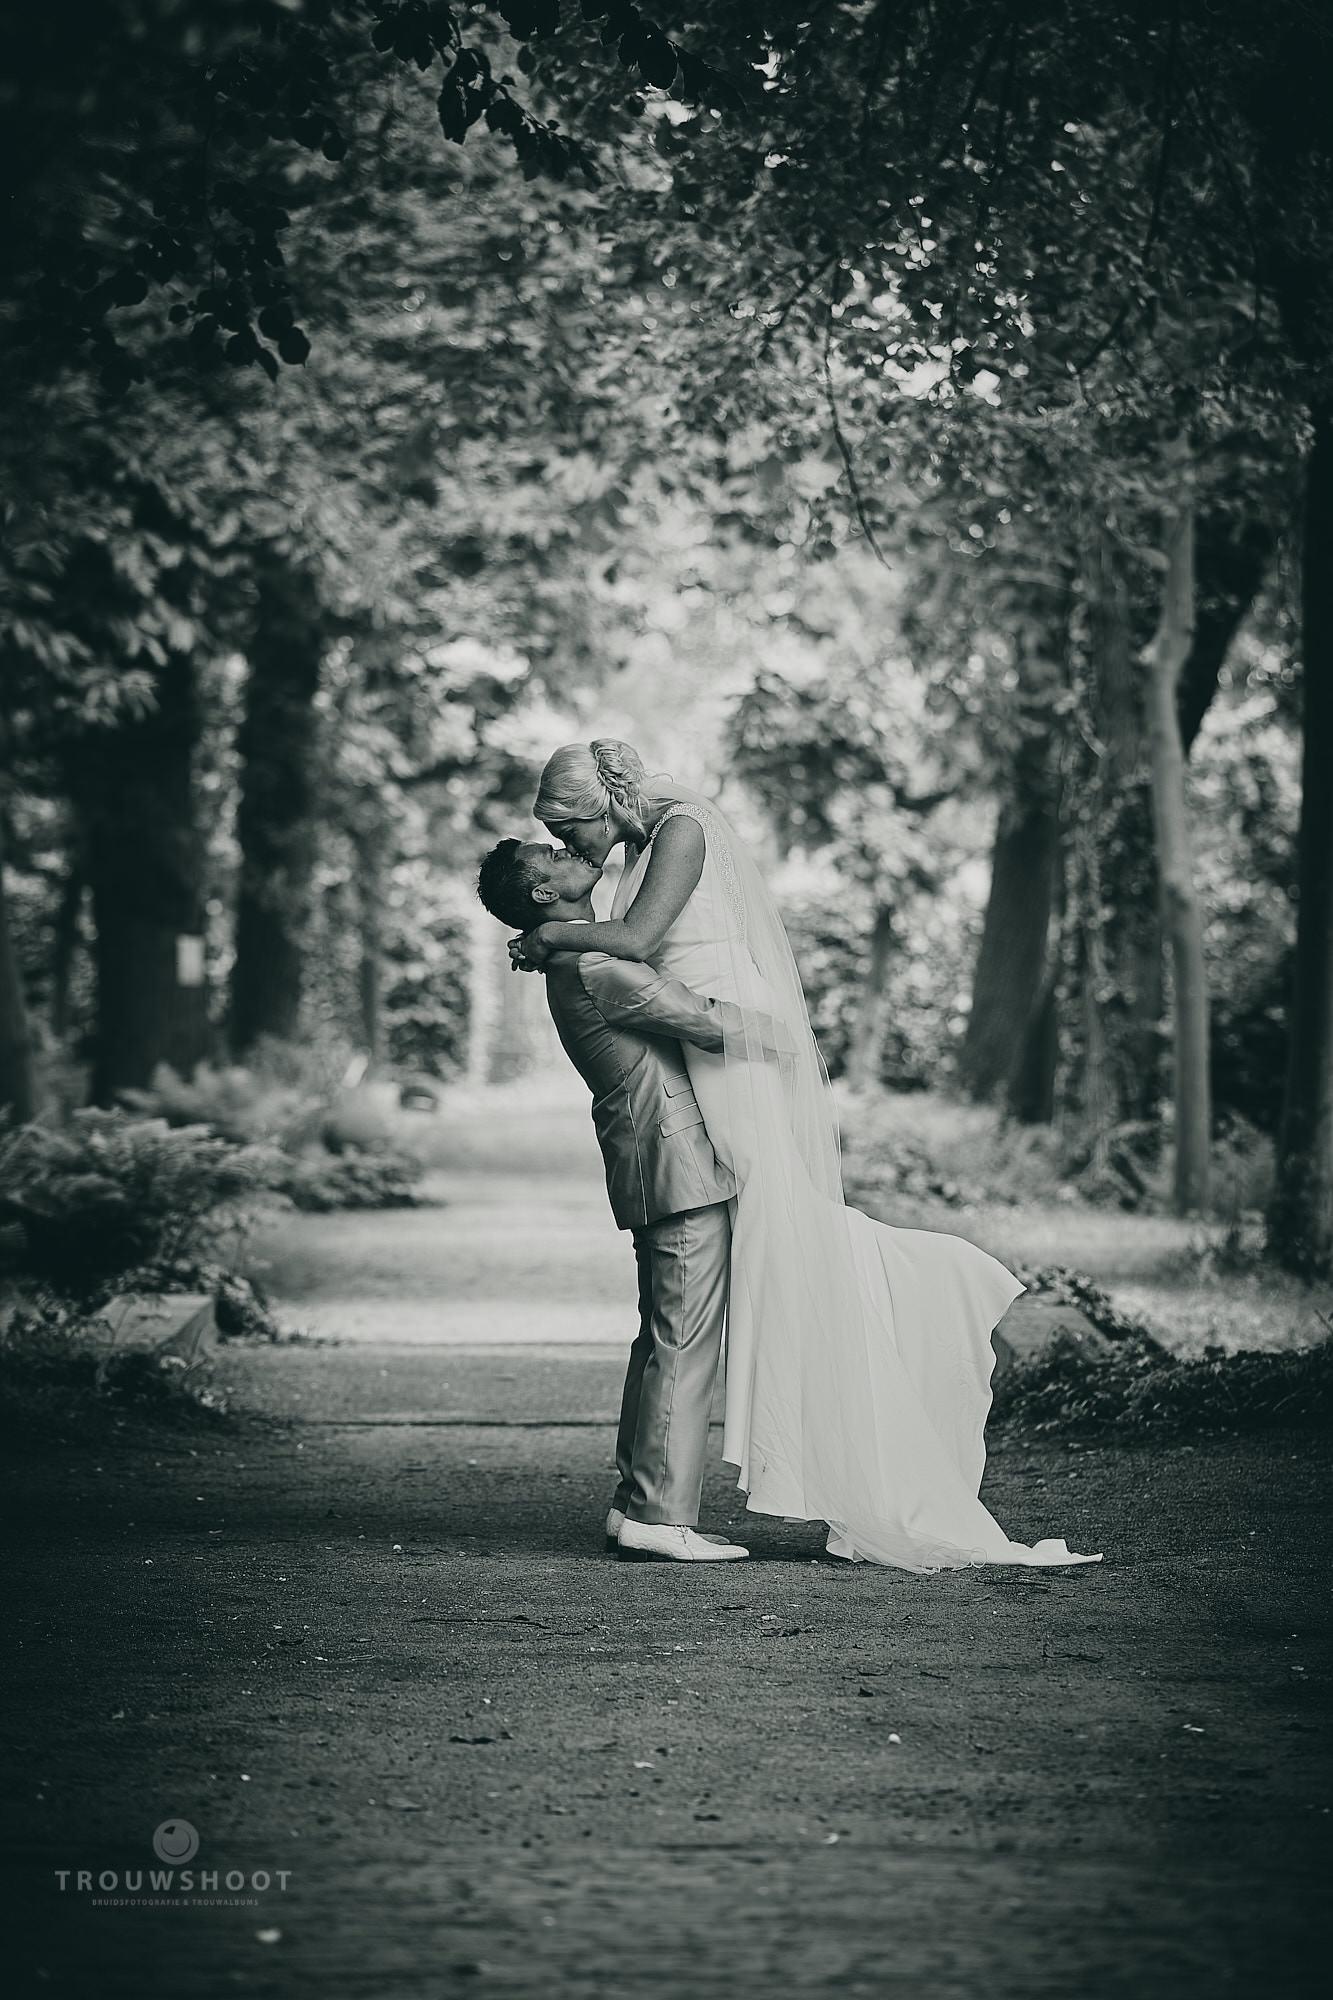 trouwshoot_bruidsfotografie_trouwfoto_291.jpg